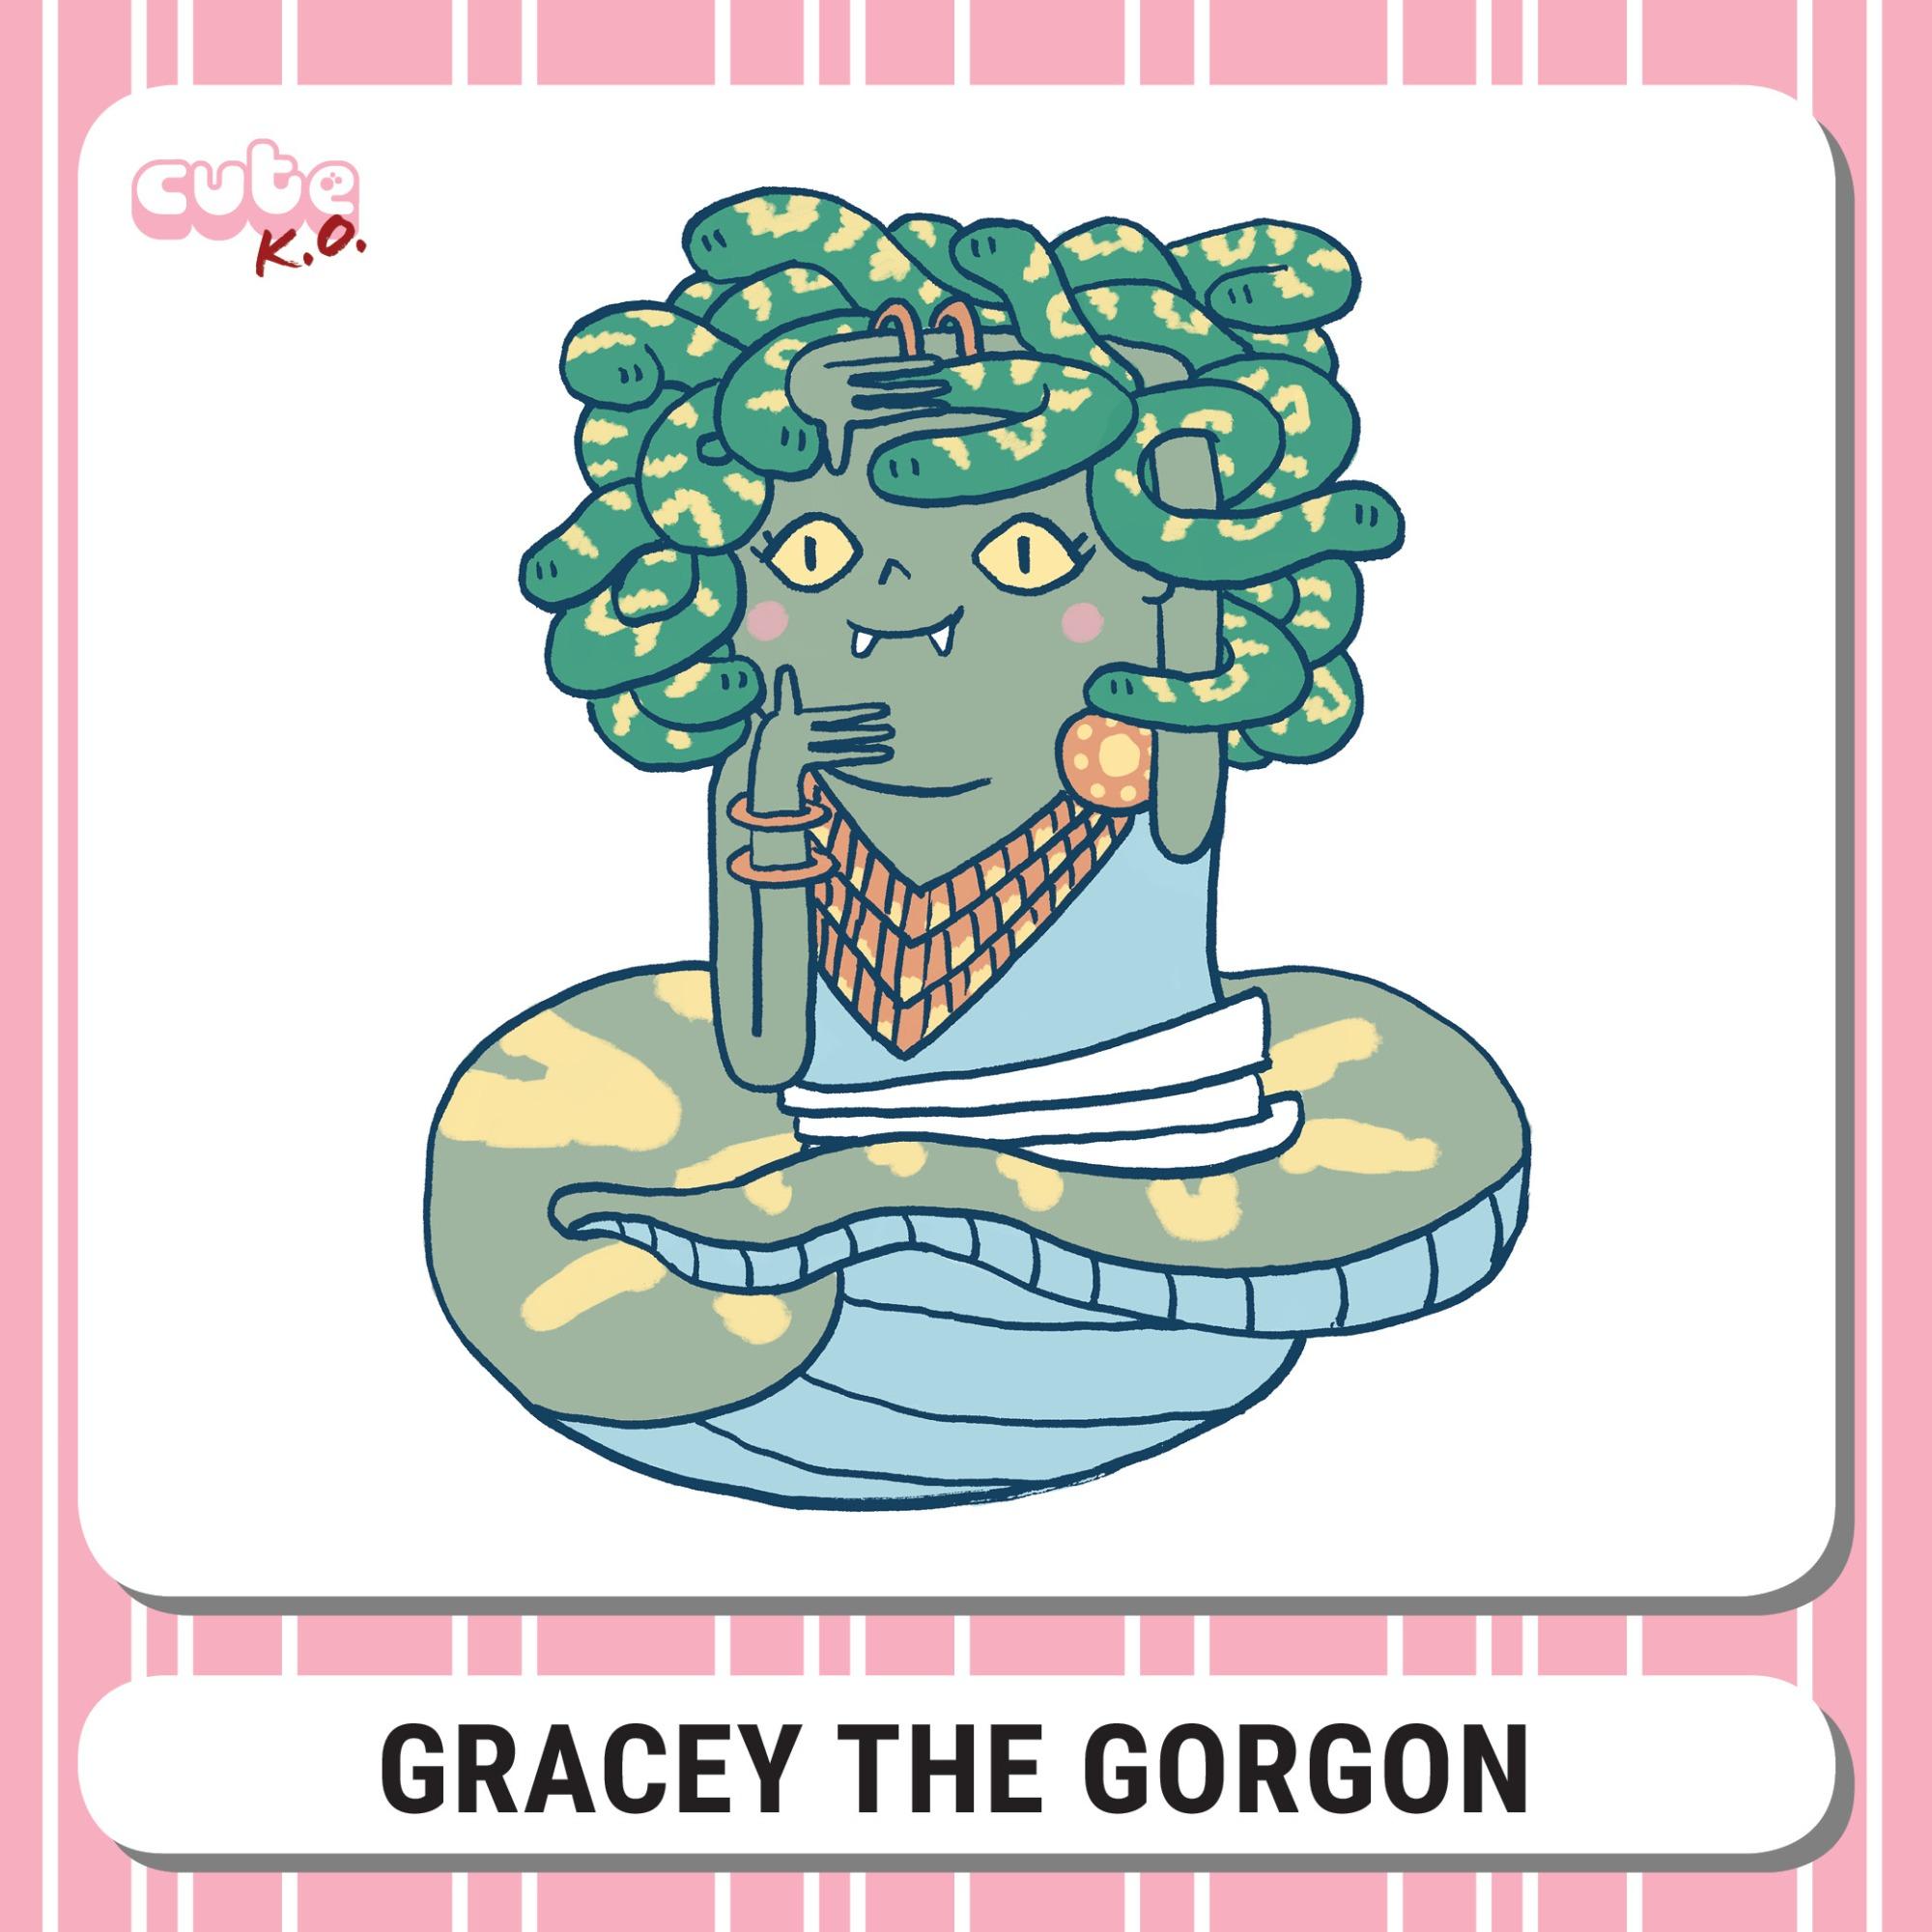 Cute K.O. 2019 Round Three: Gracey the Gorgon